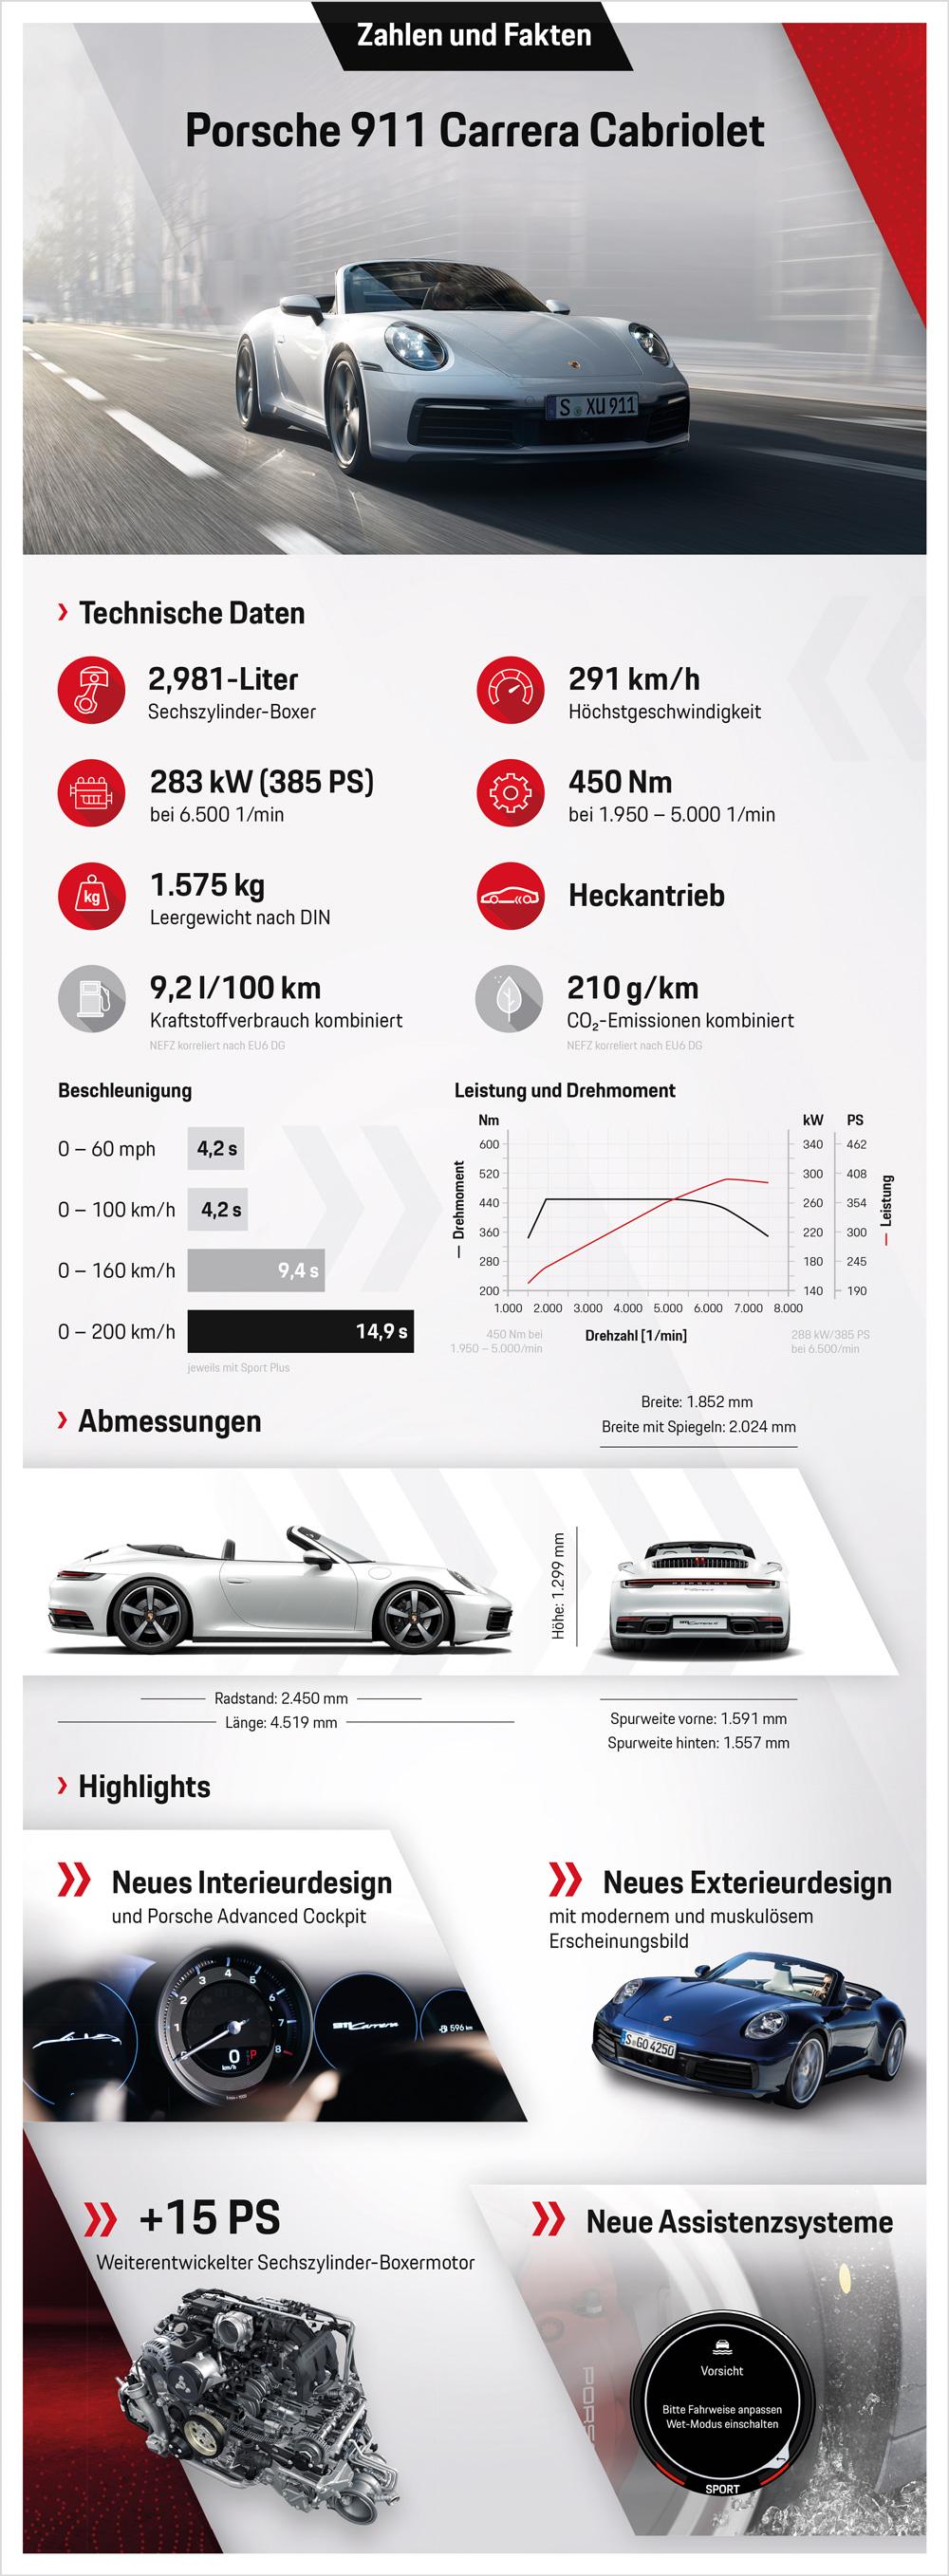 Porsche 911 Carrera Cabriolet 992 technische Daten